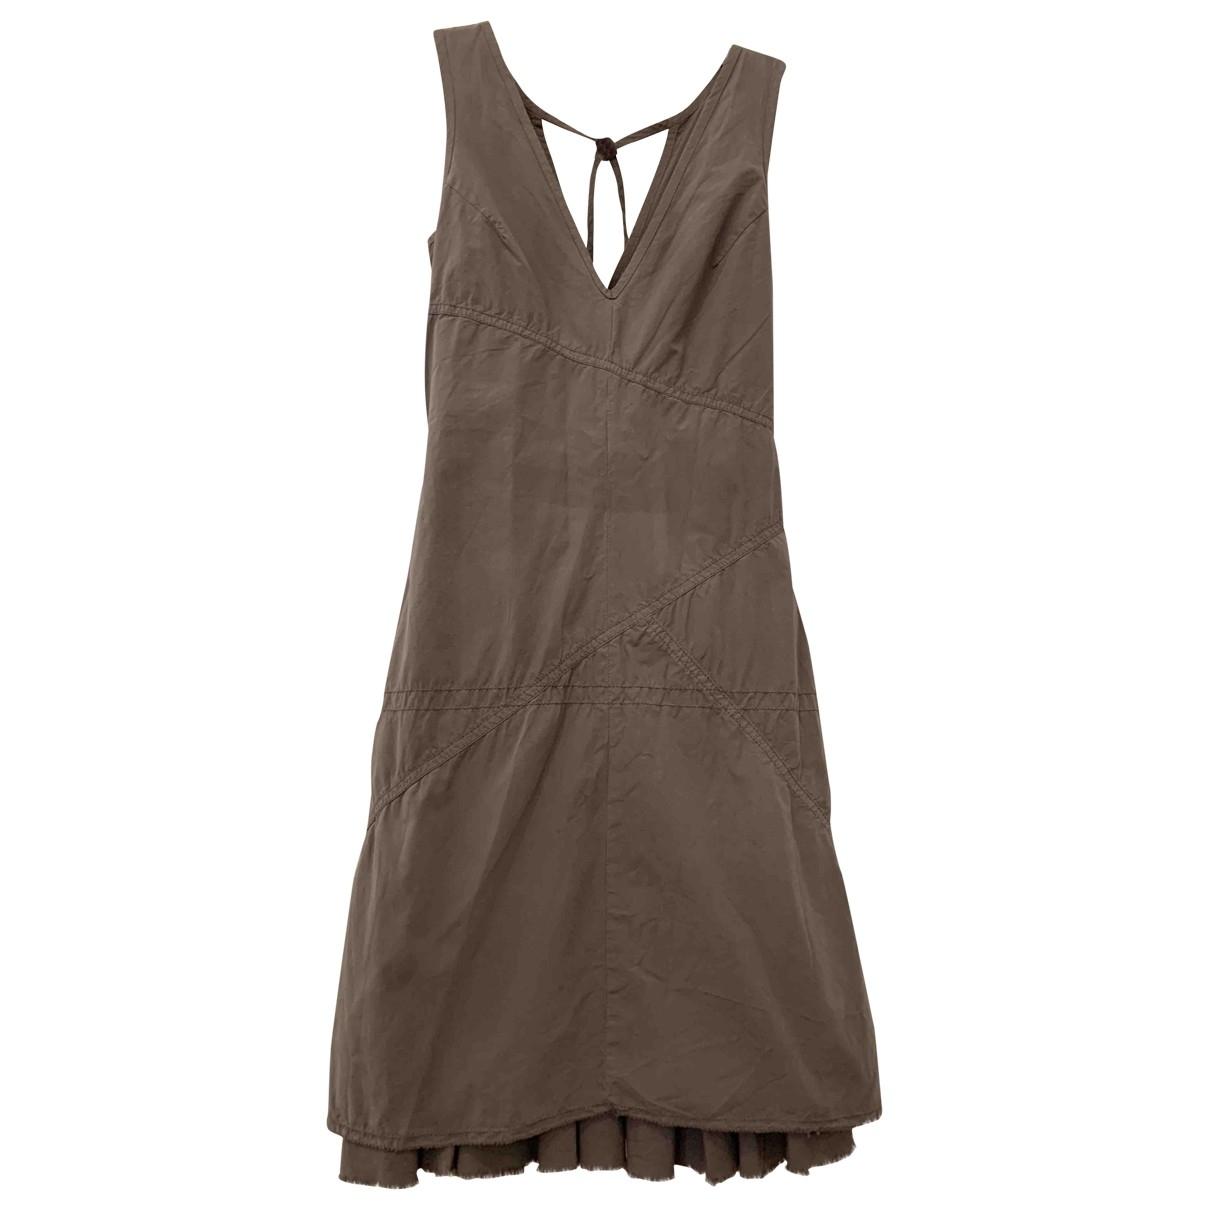 Boss Orange \N Brown Cotton dress for Women 34 FR